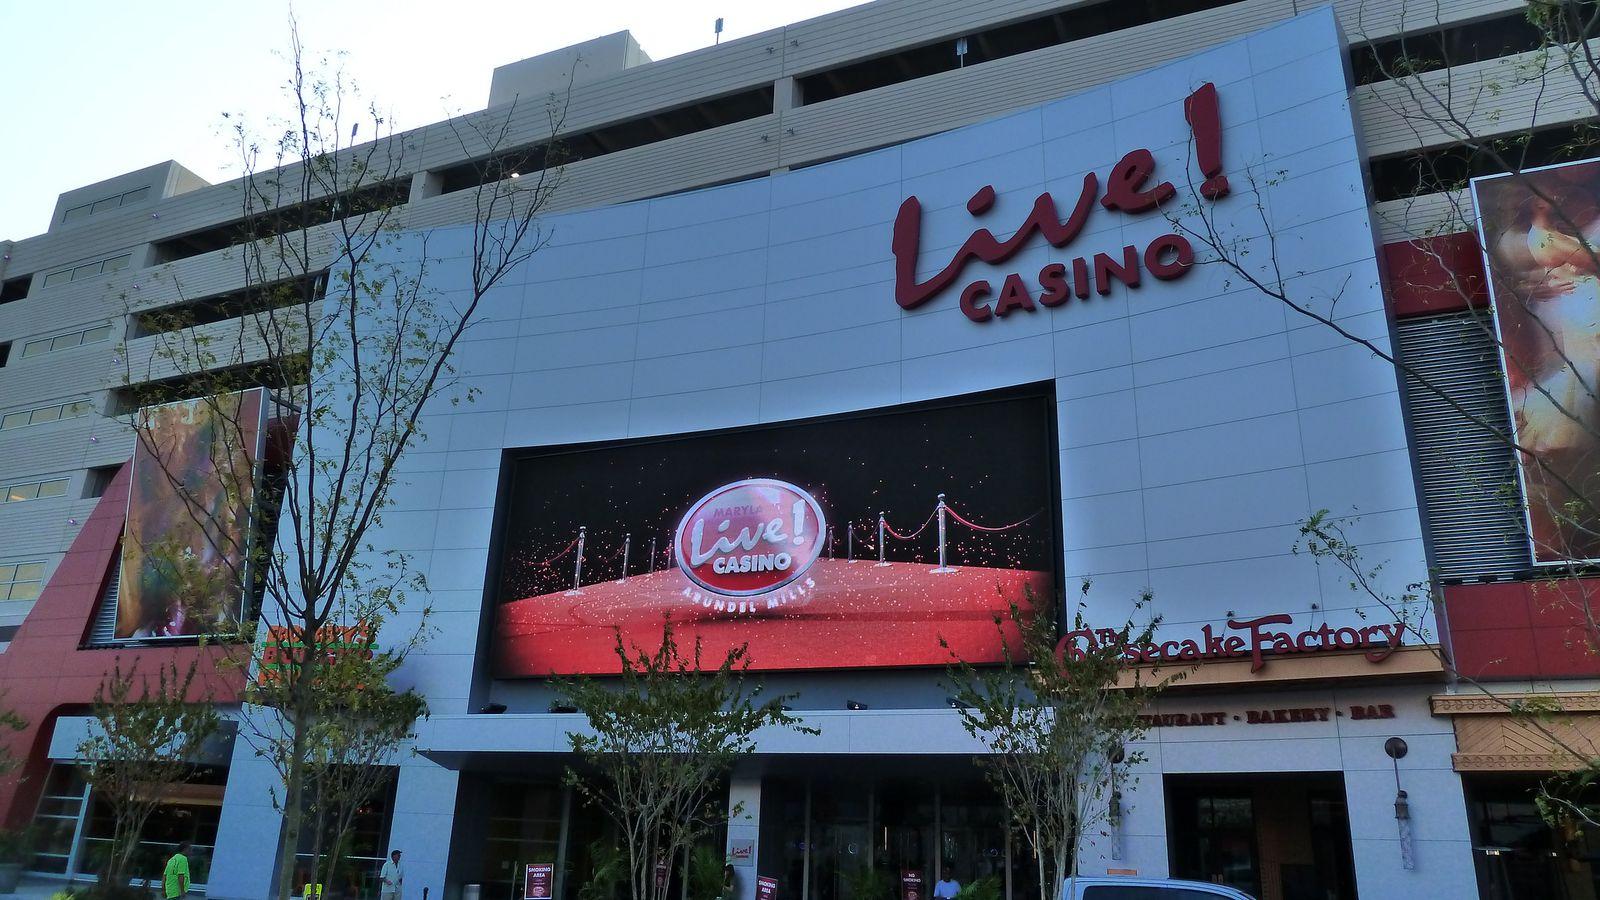 West virginia casinos list